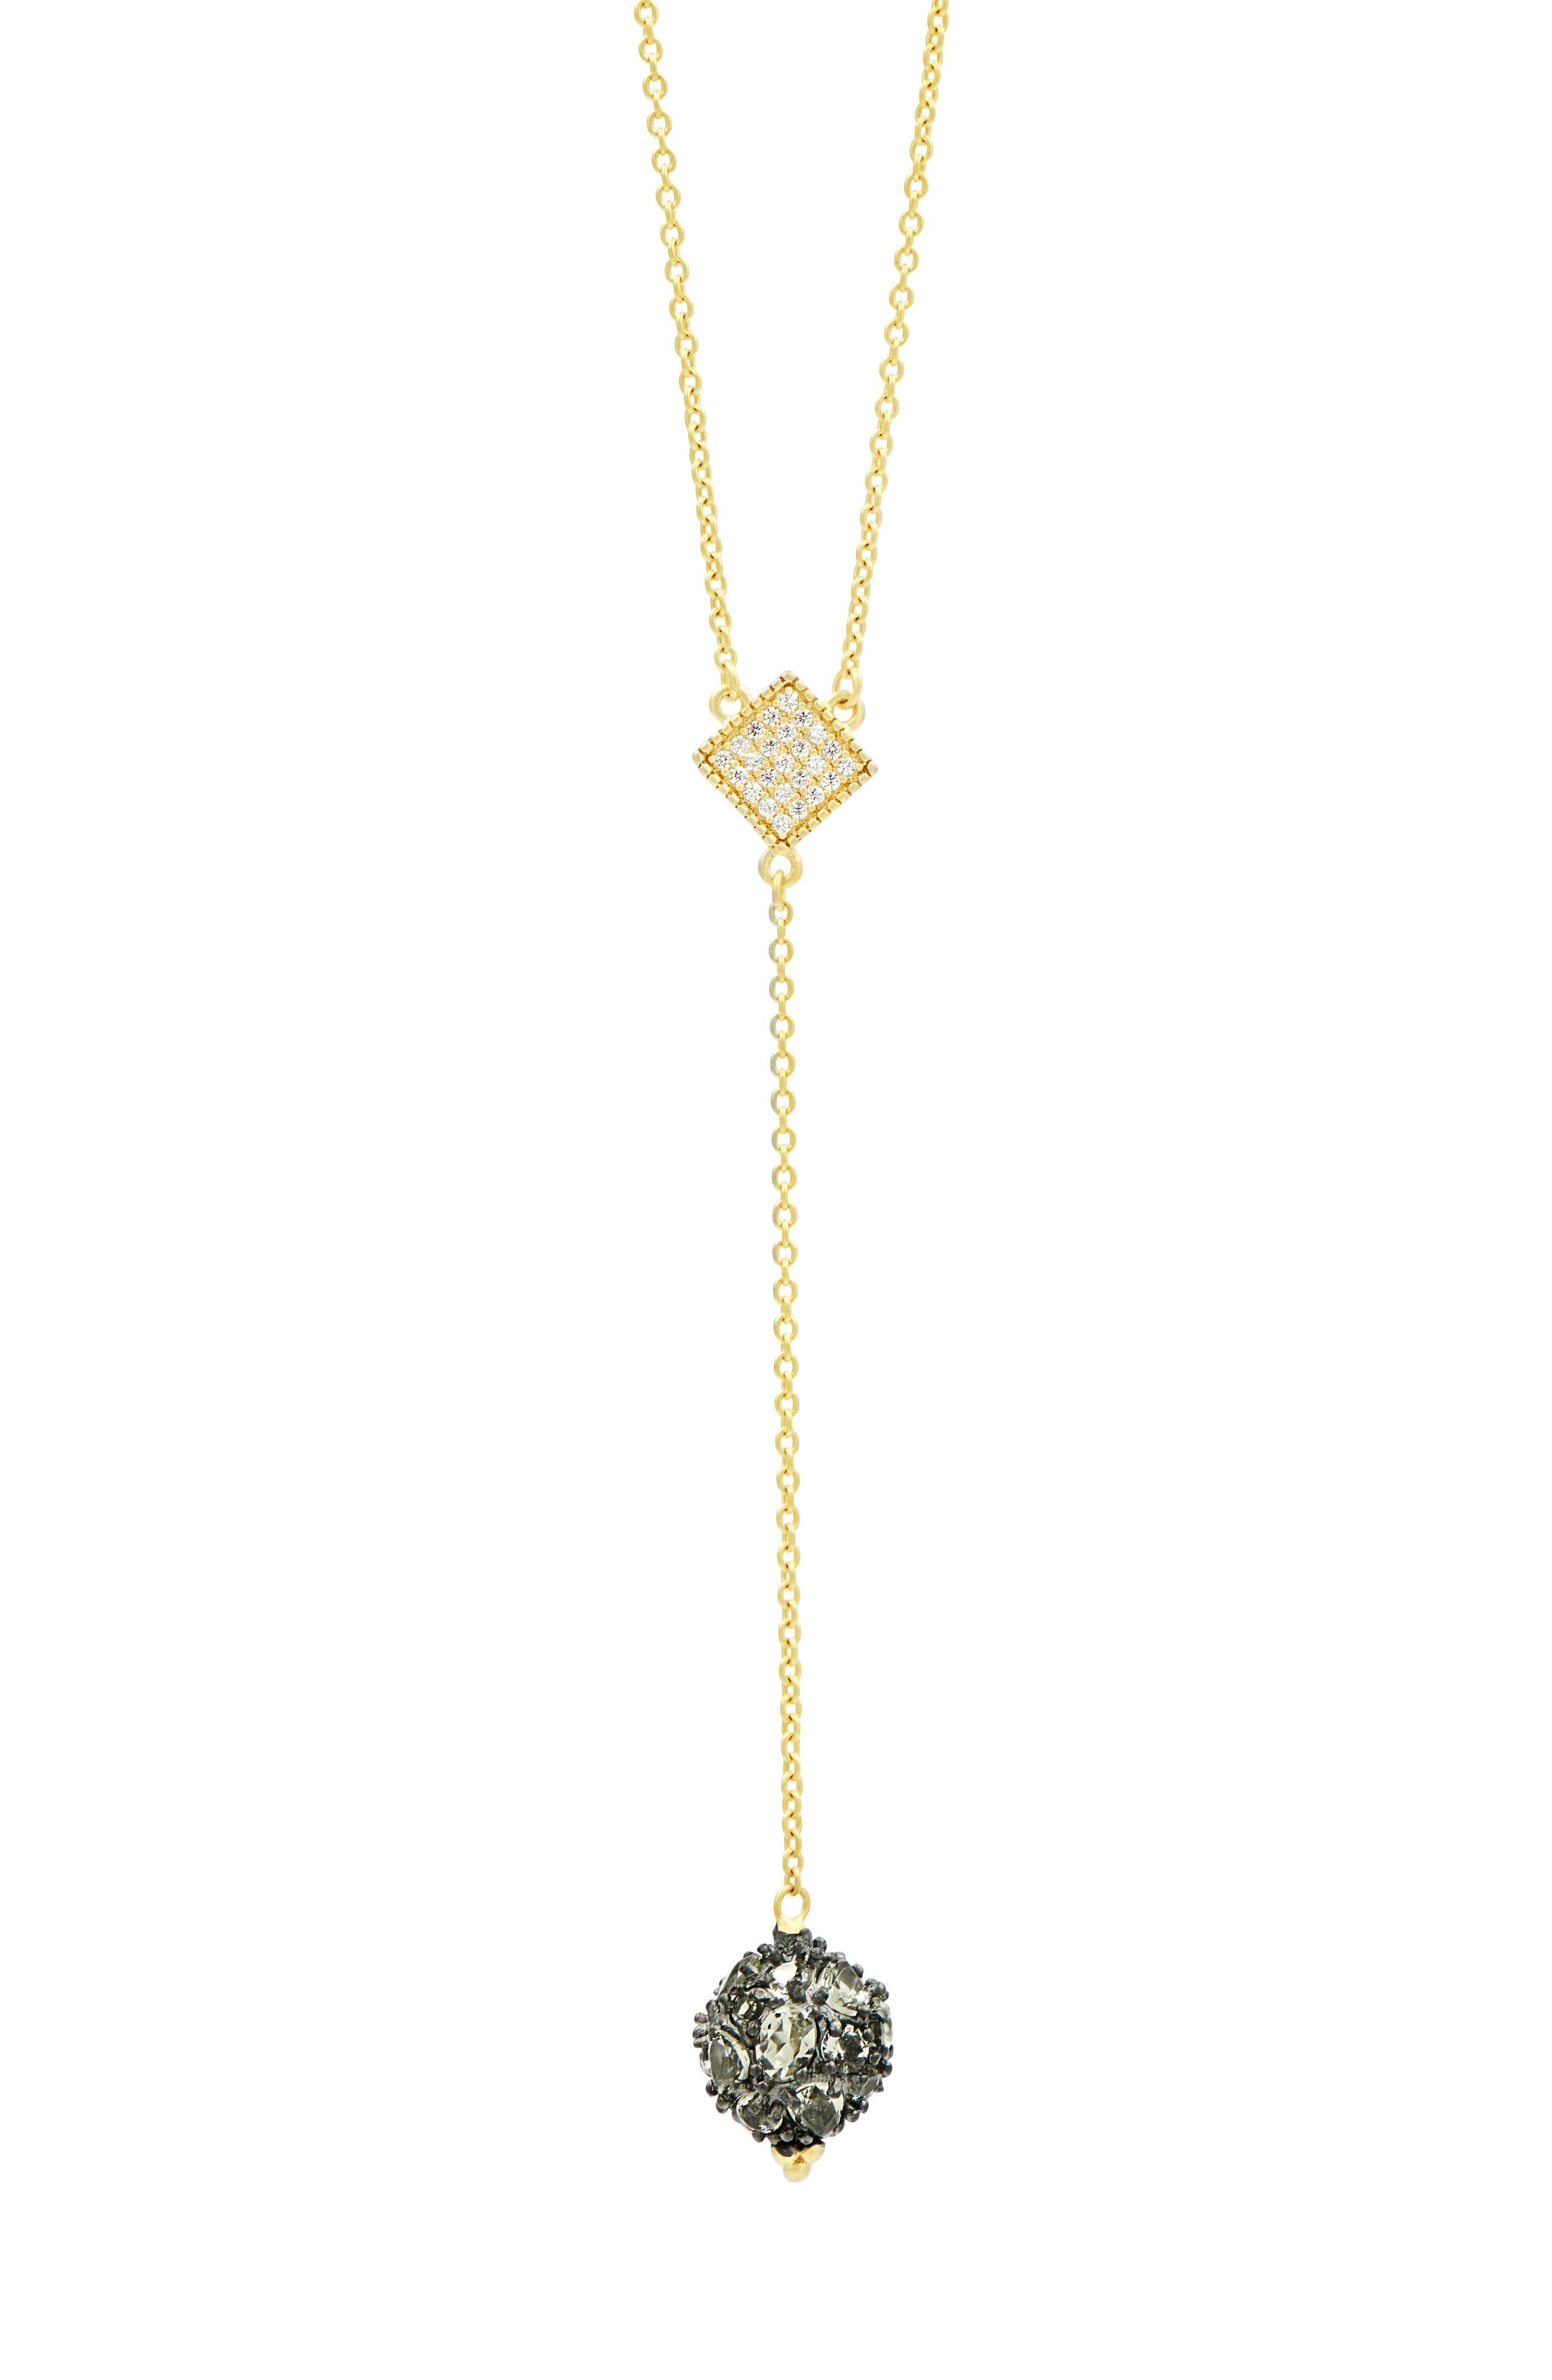 Alternate Image 1 Selected - FREIDA ROTHMAN Rose Dor Y-Shape Necklace